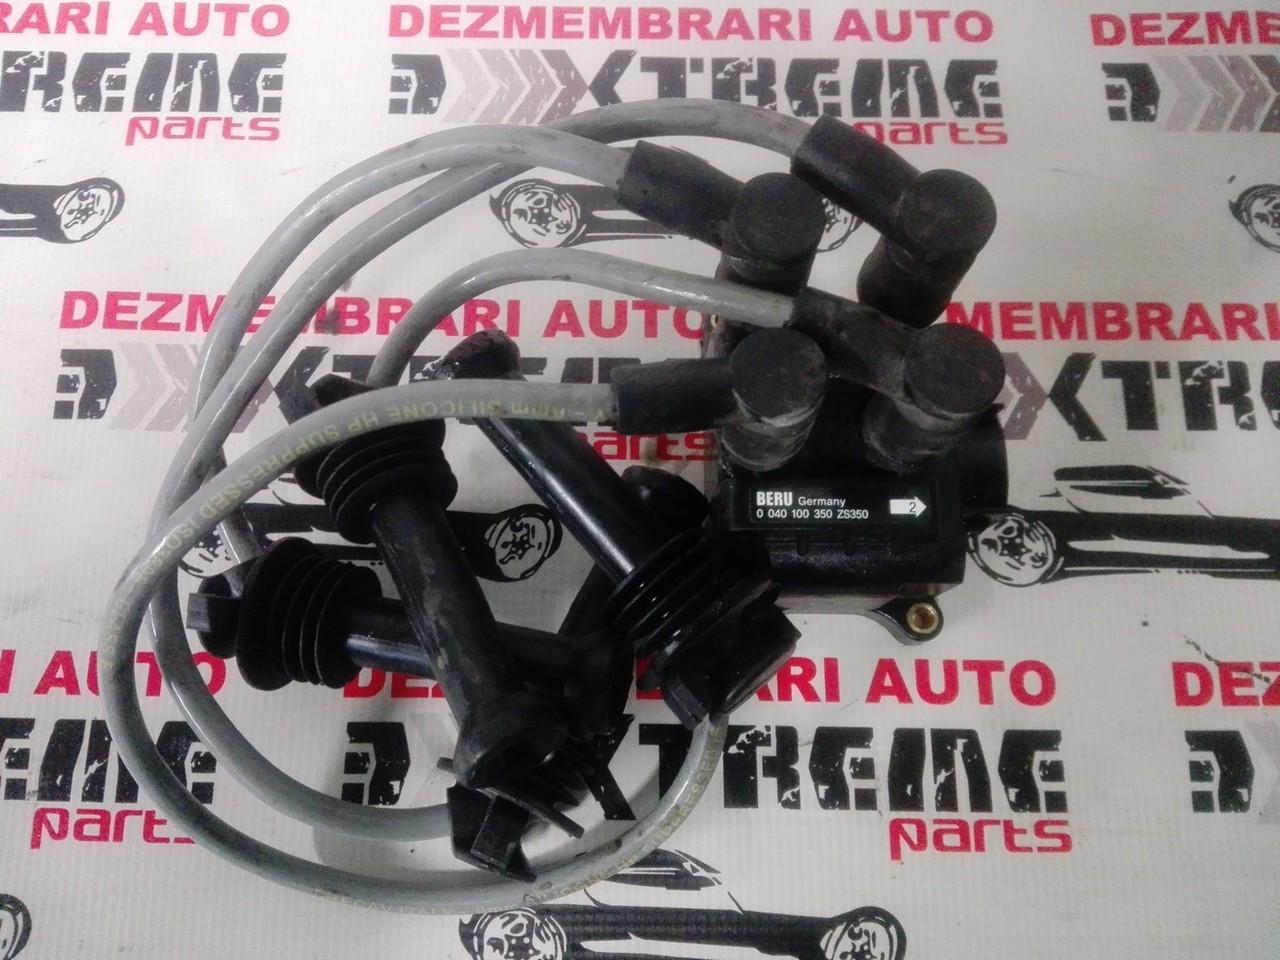 bobina BERU 0040100350 si fise pentru Ford Fiesta , Fusion , Ka , Focus